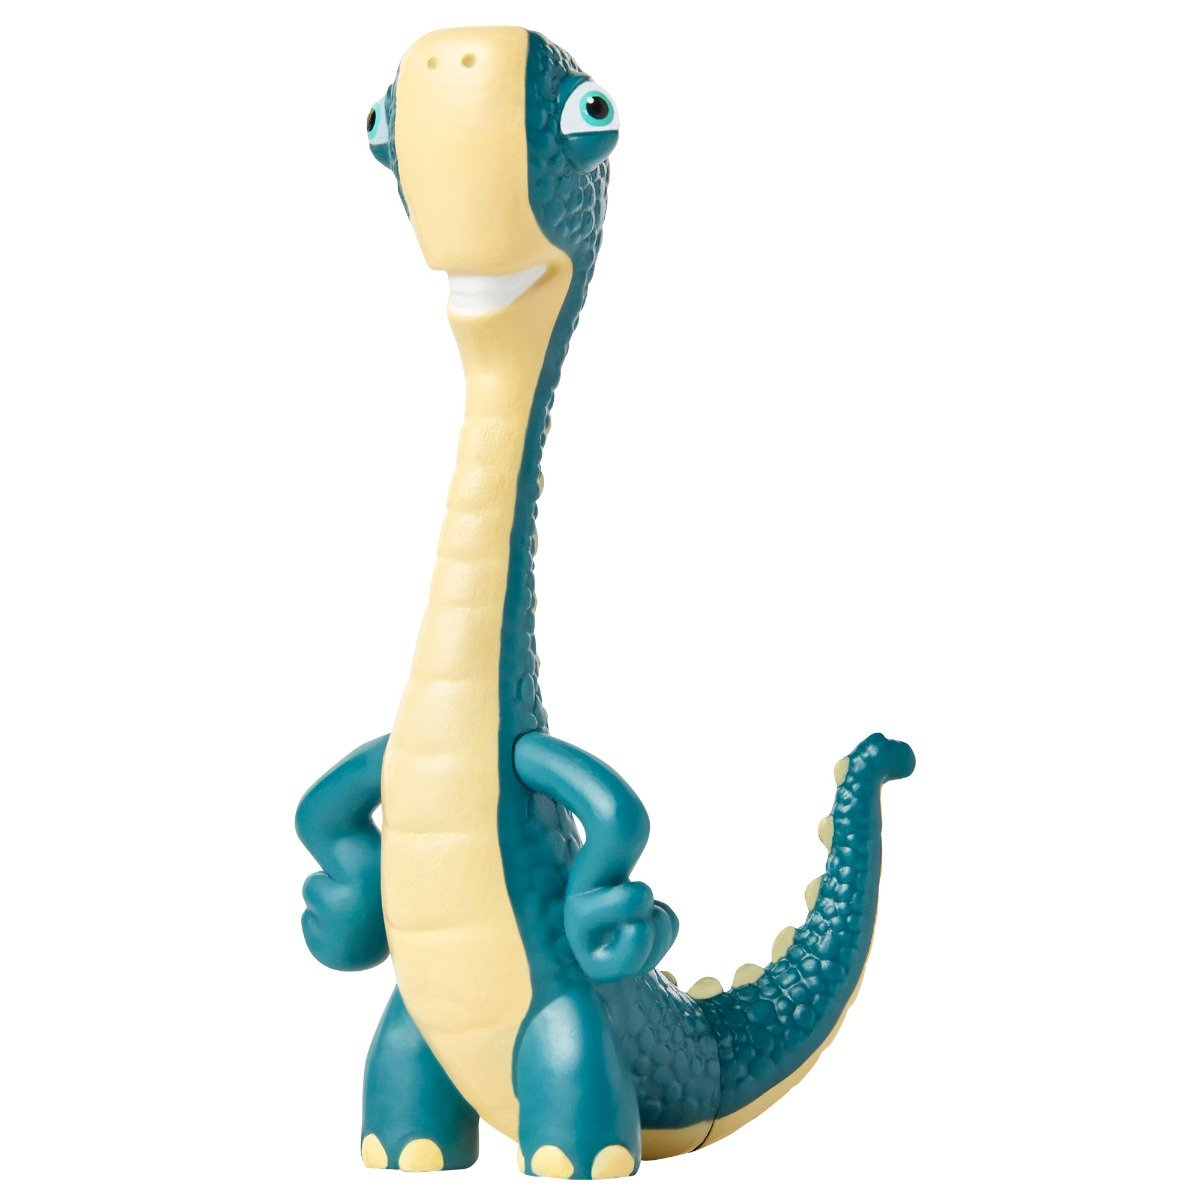 Figurina articulata dinozaur Gigantosaurus, Bill imagine